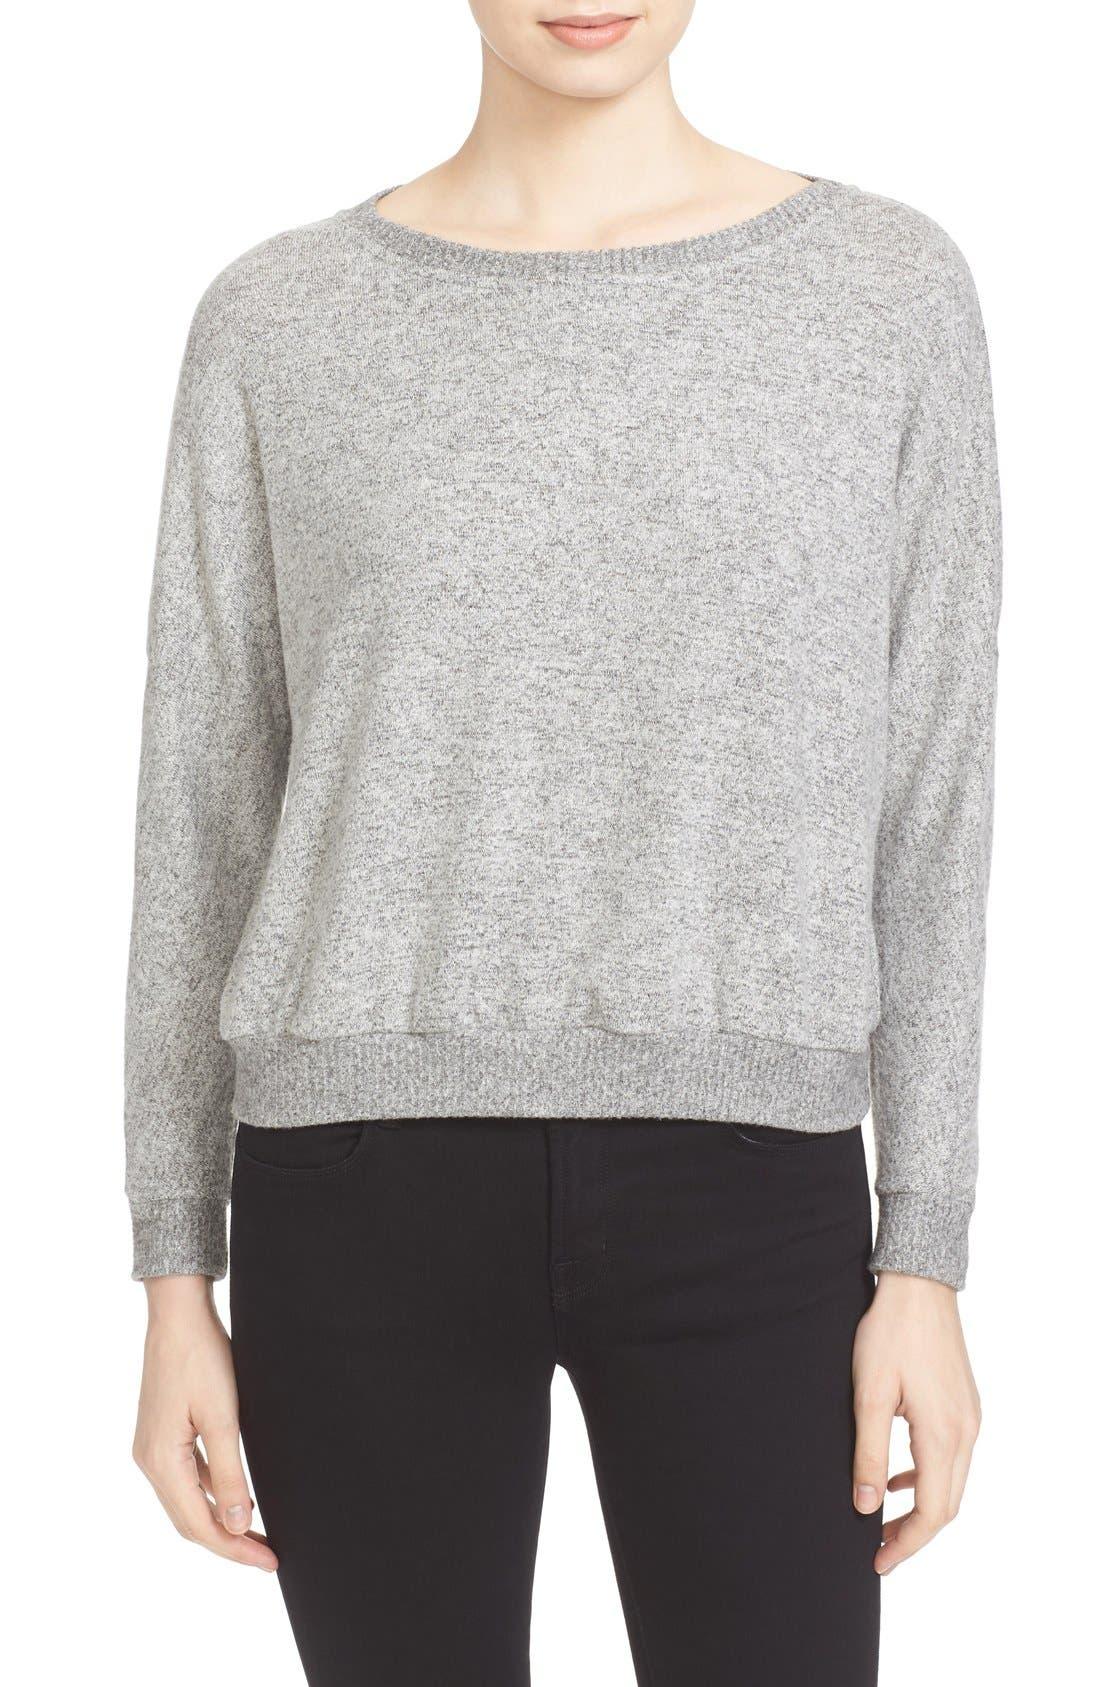 Soft Joie Giardia Drop Shoulder Sweater,                         Main,                         color,